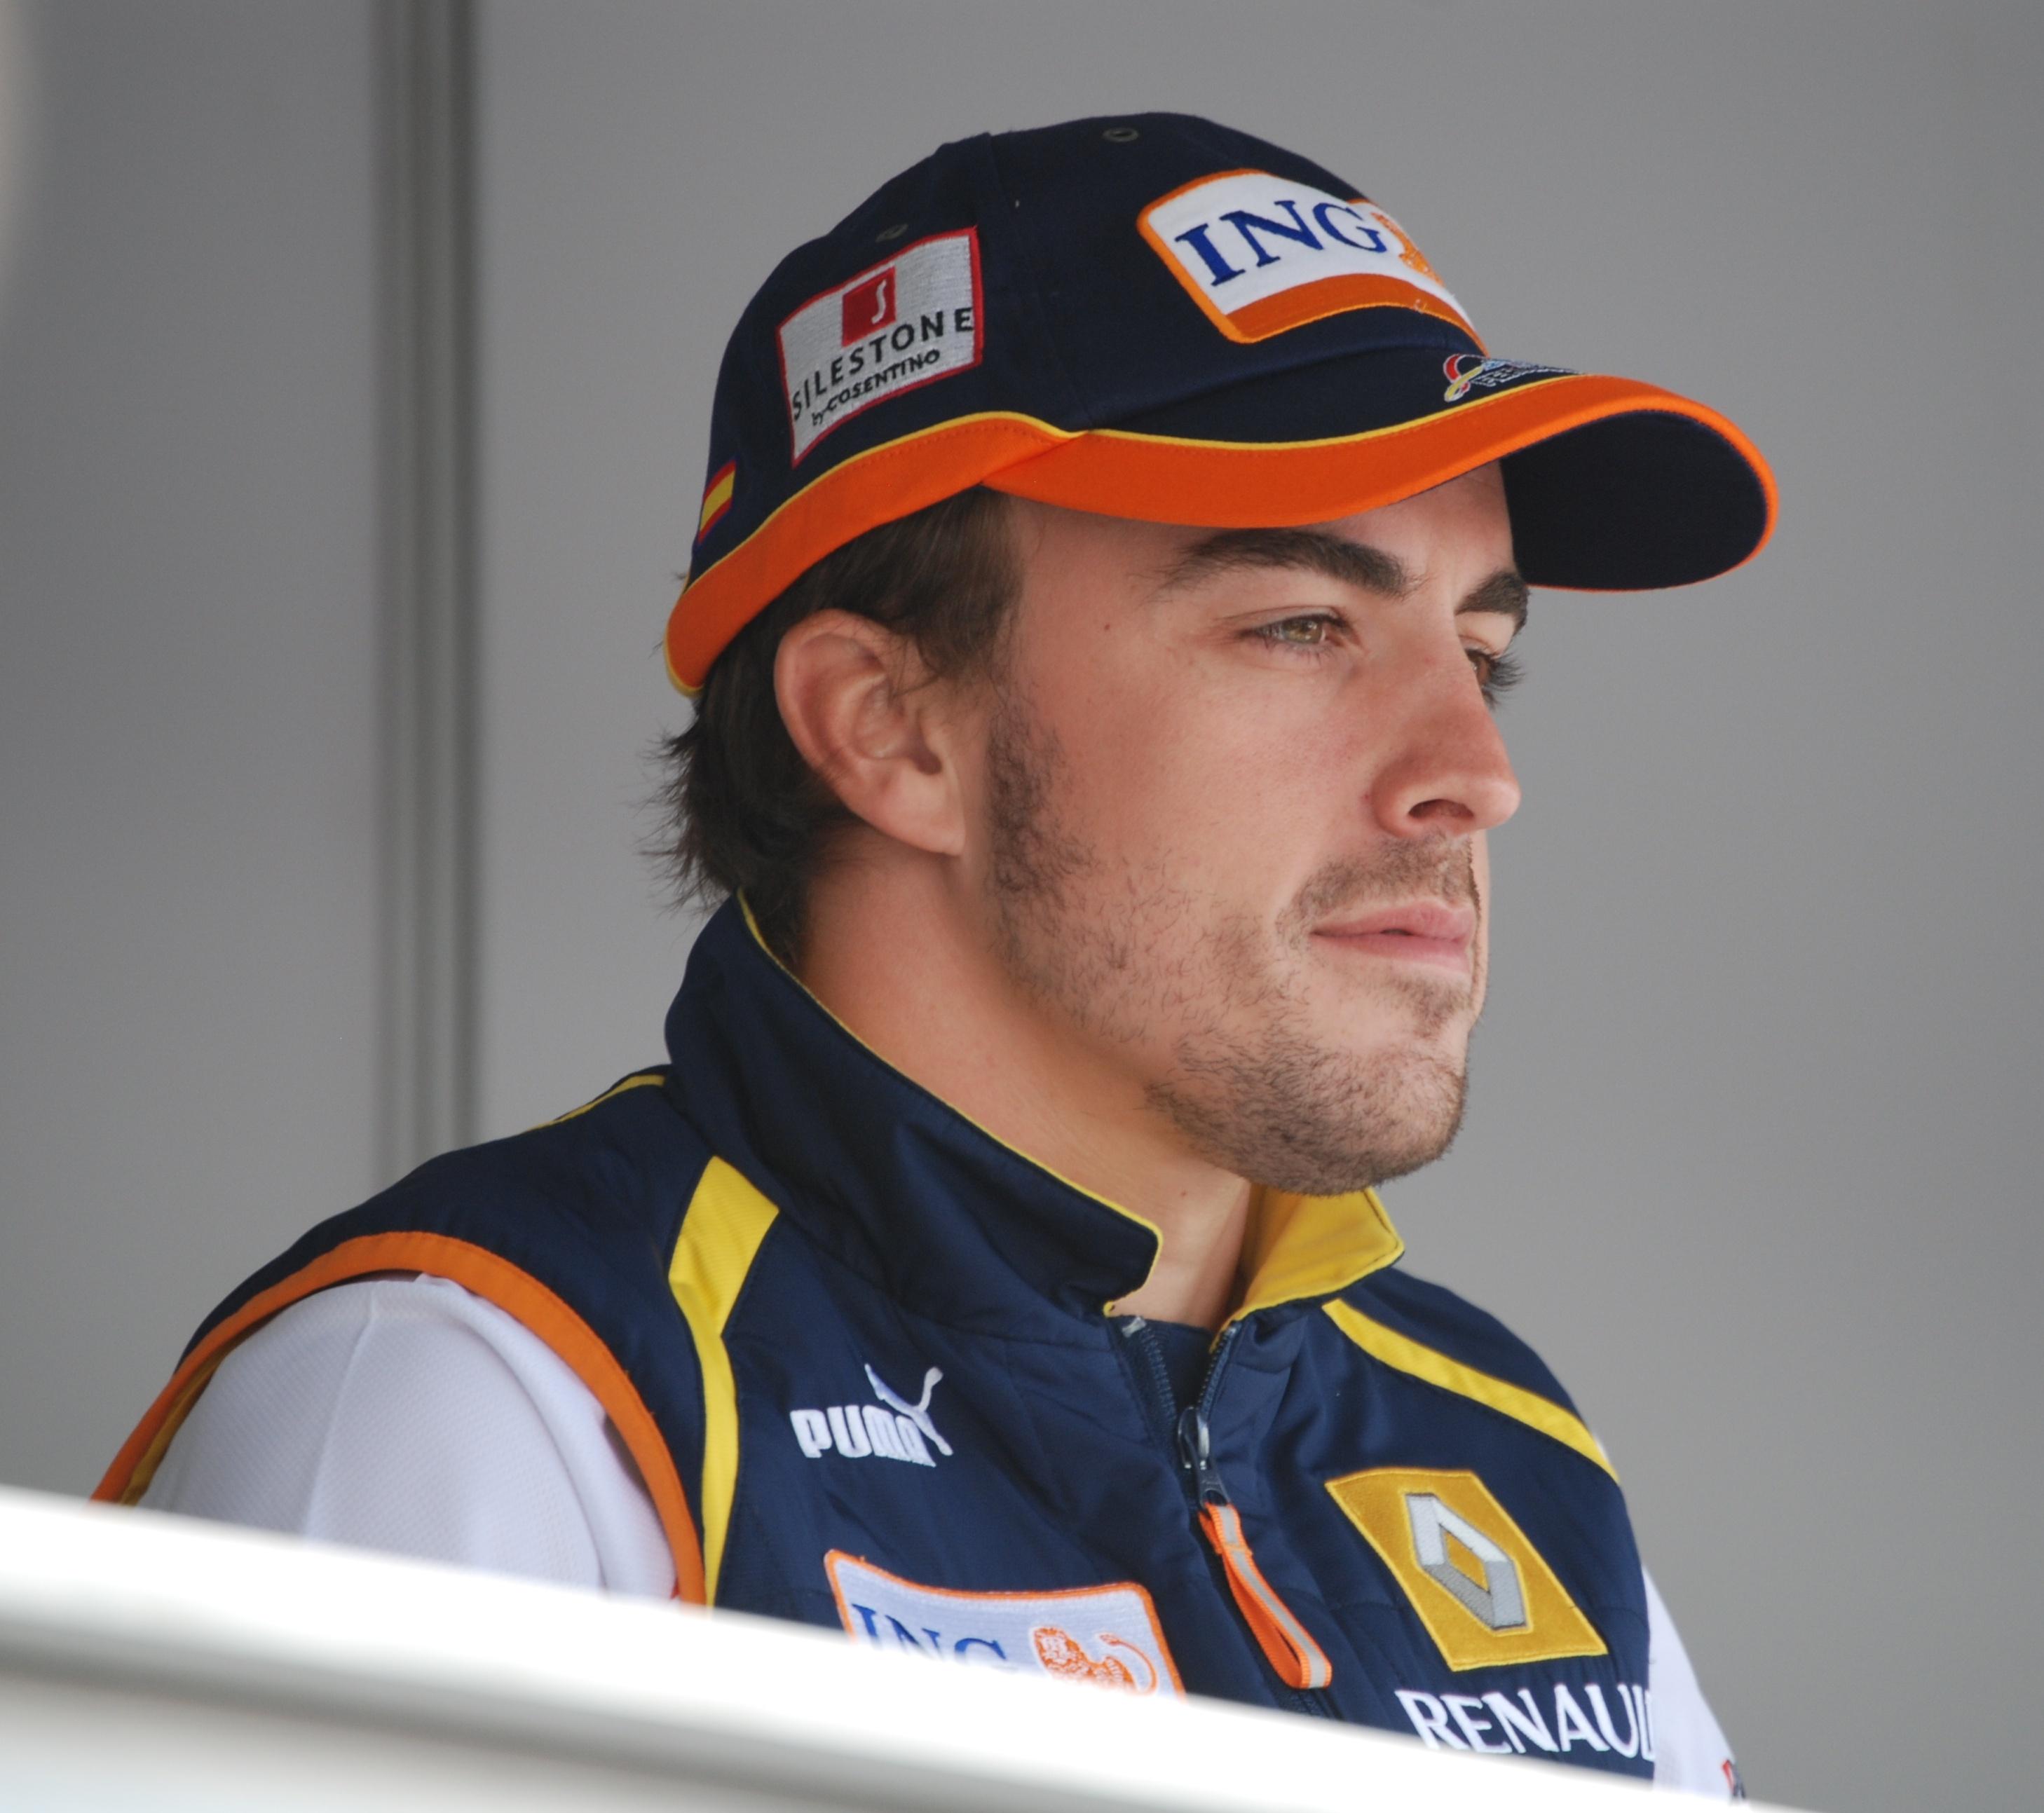 Magic Fernando Alonso Fansite: Volker Ernat Peoplecheck.de